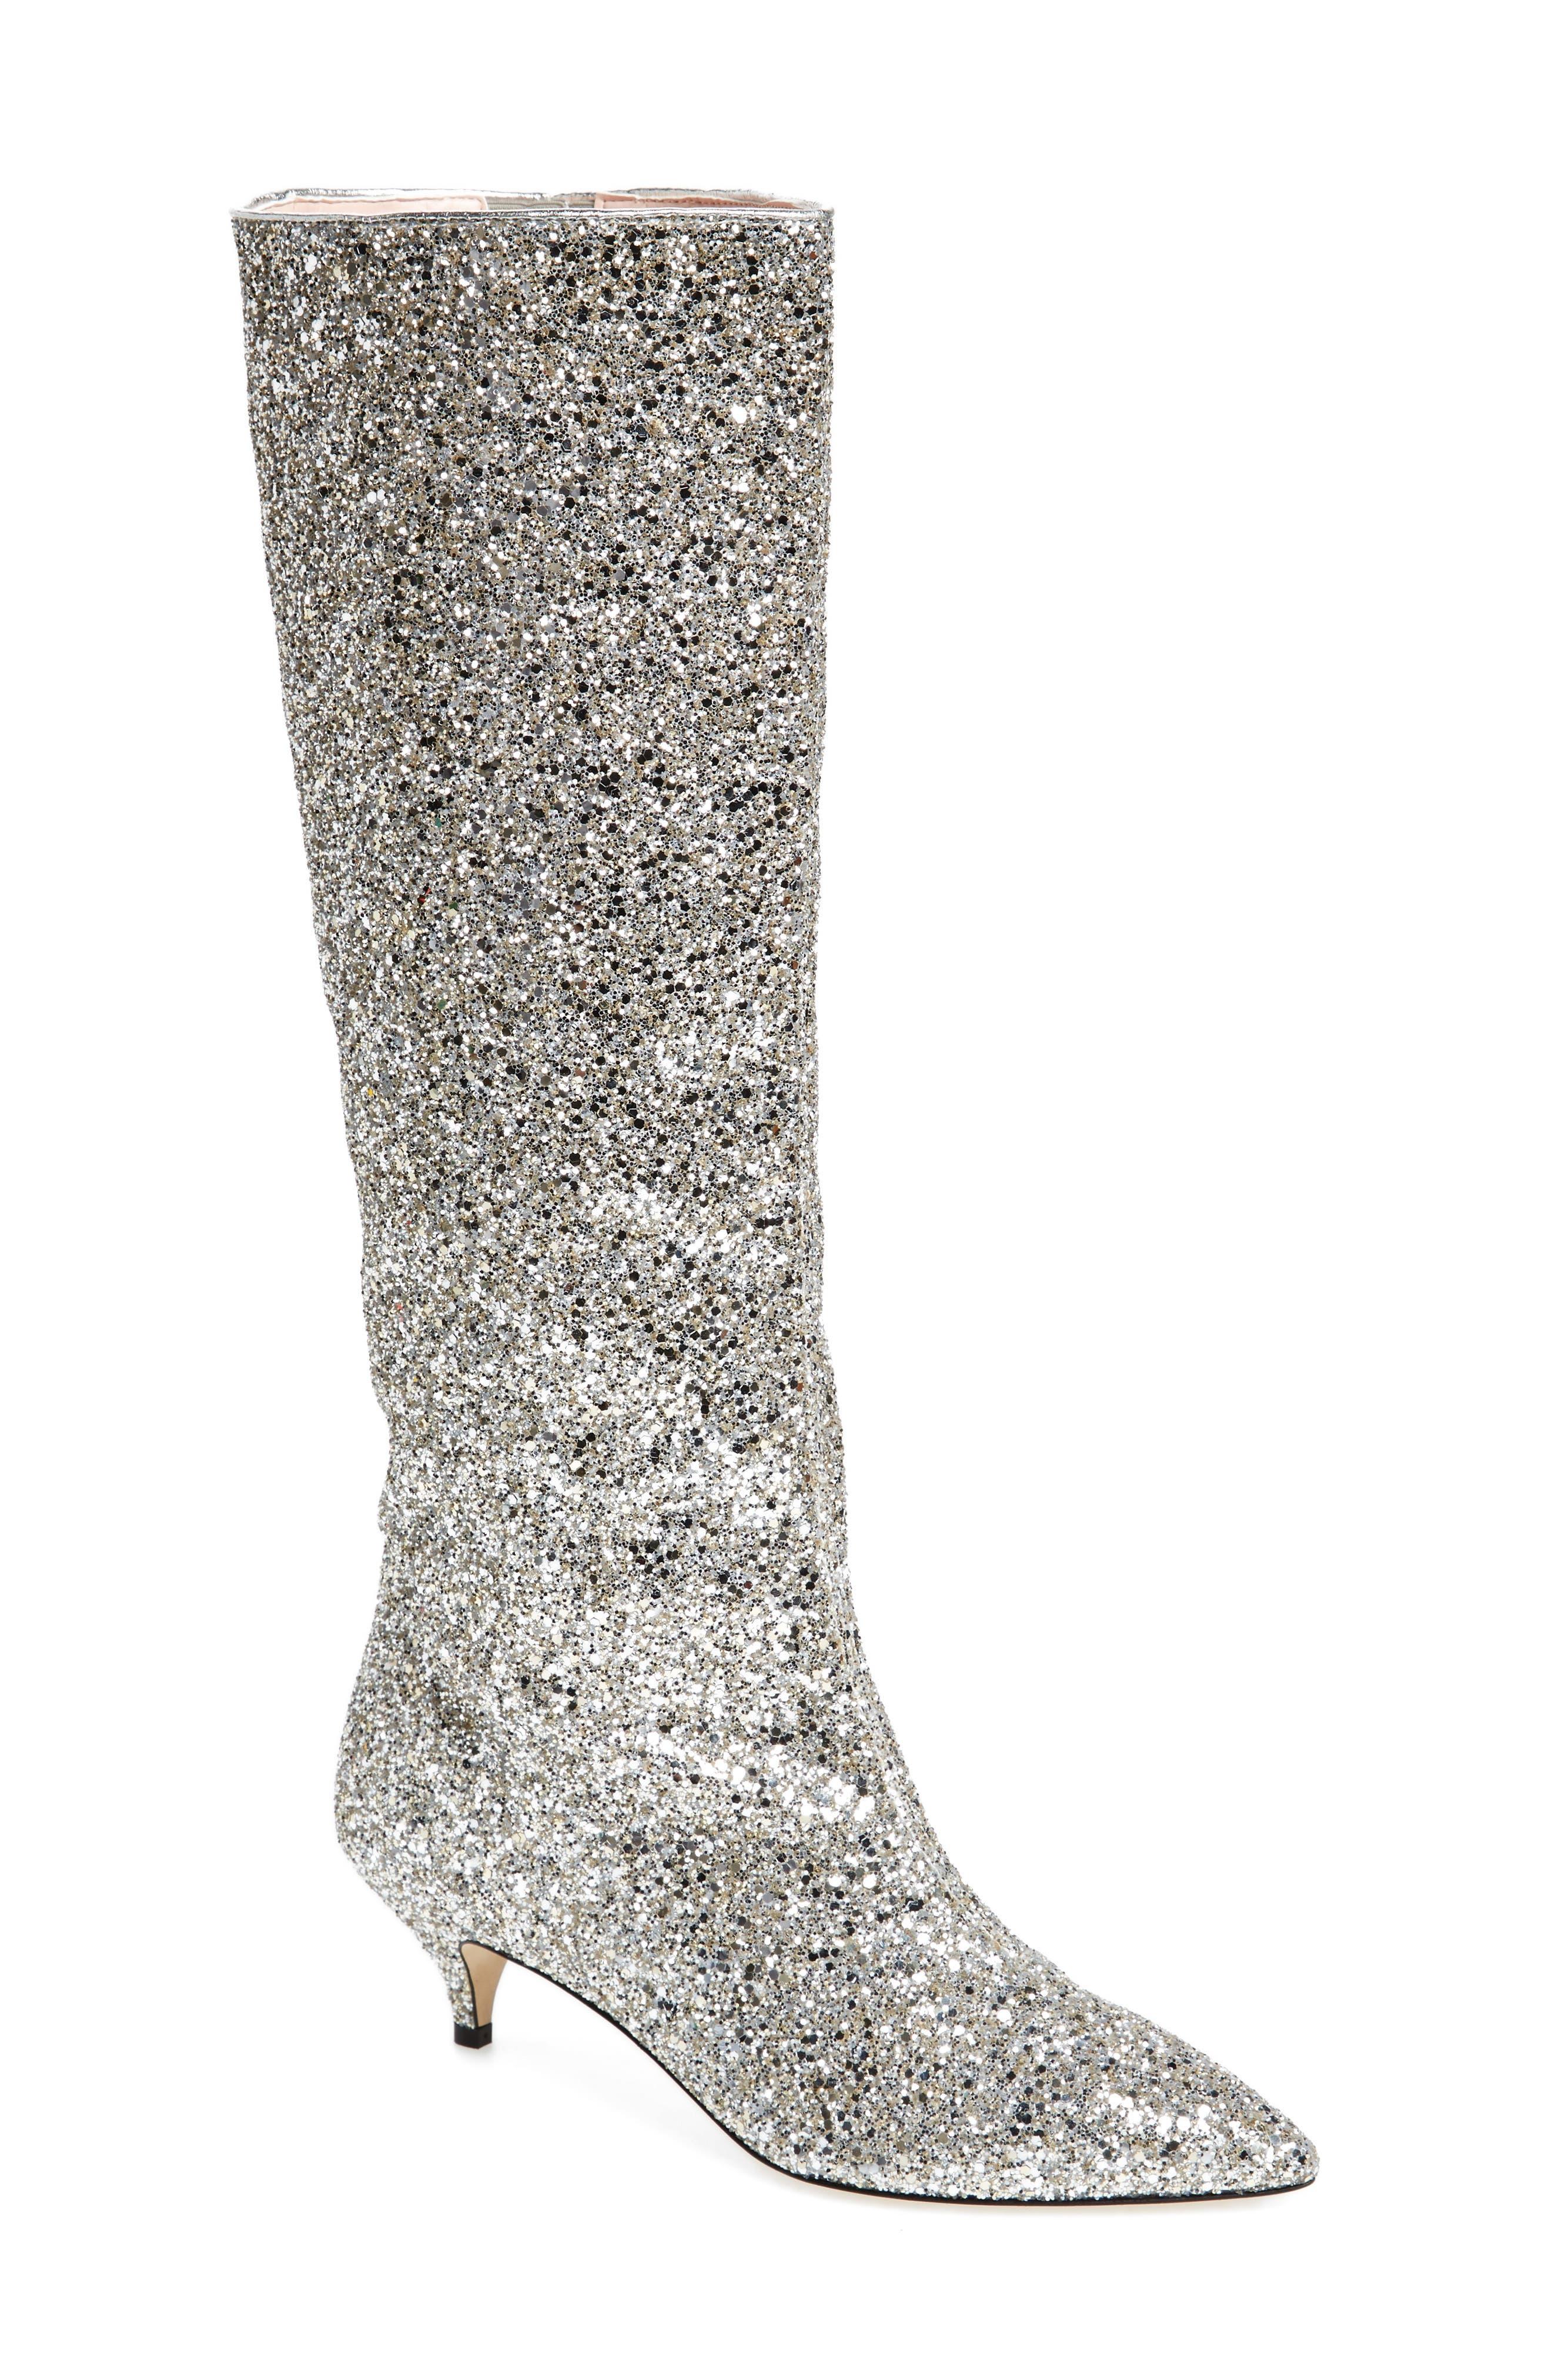 olina glitter knee high boot,                         Main,                         color, Silver/ Gold Glitter